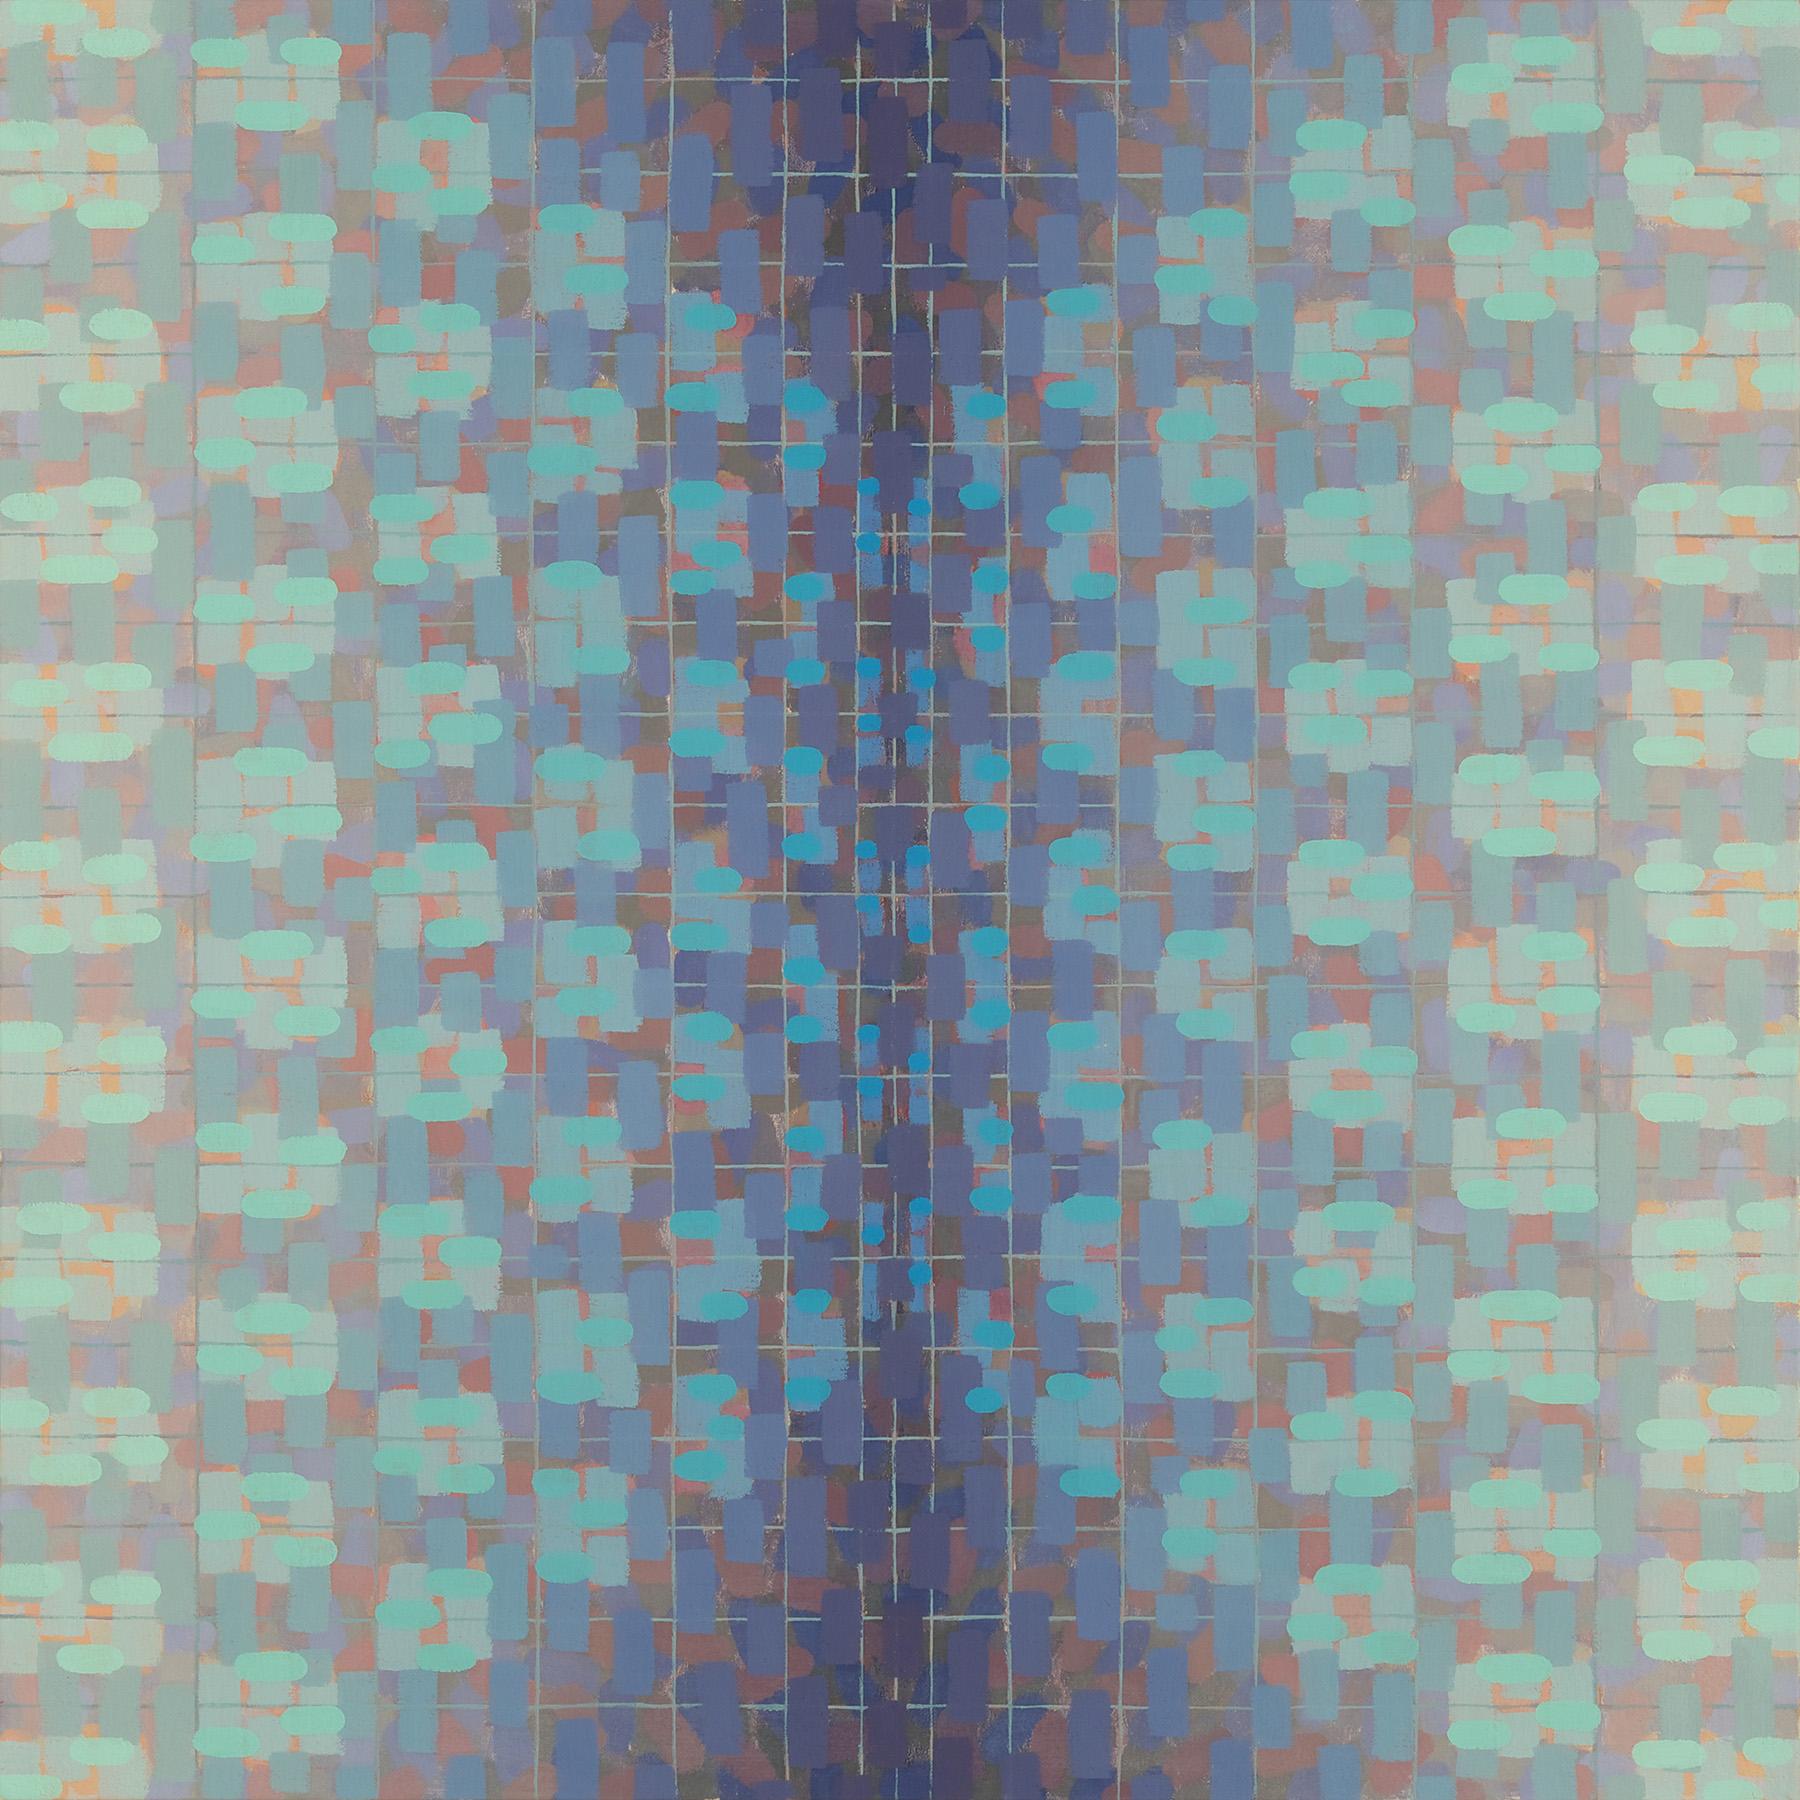 Rachael Wren, Blue Yonder, 2013, oil on linen, 20 x 20 inches (courtesy of Garis